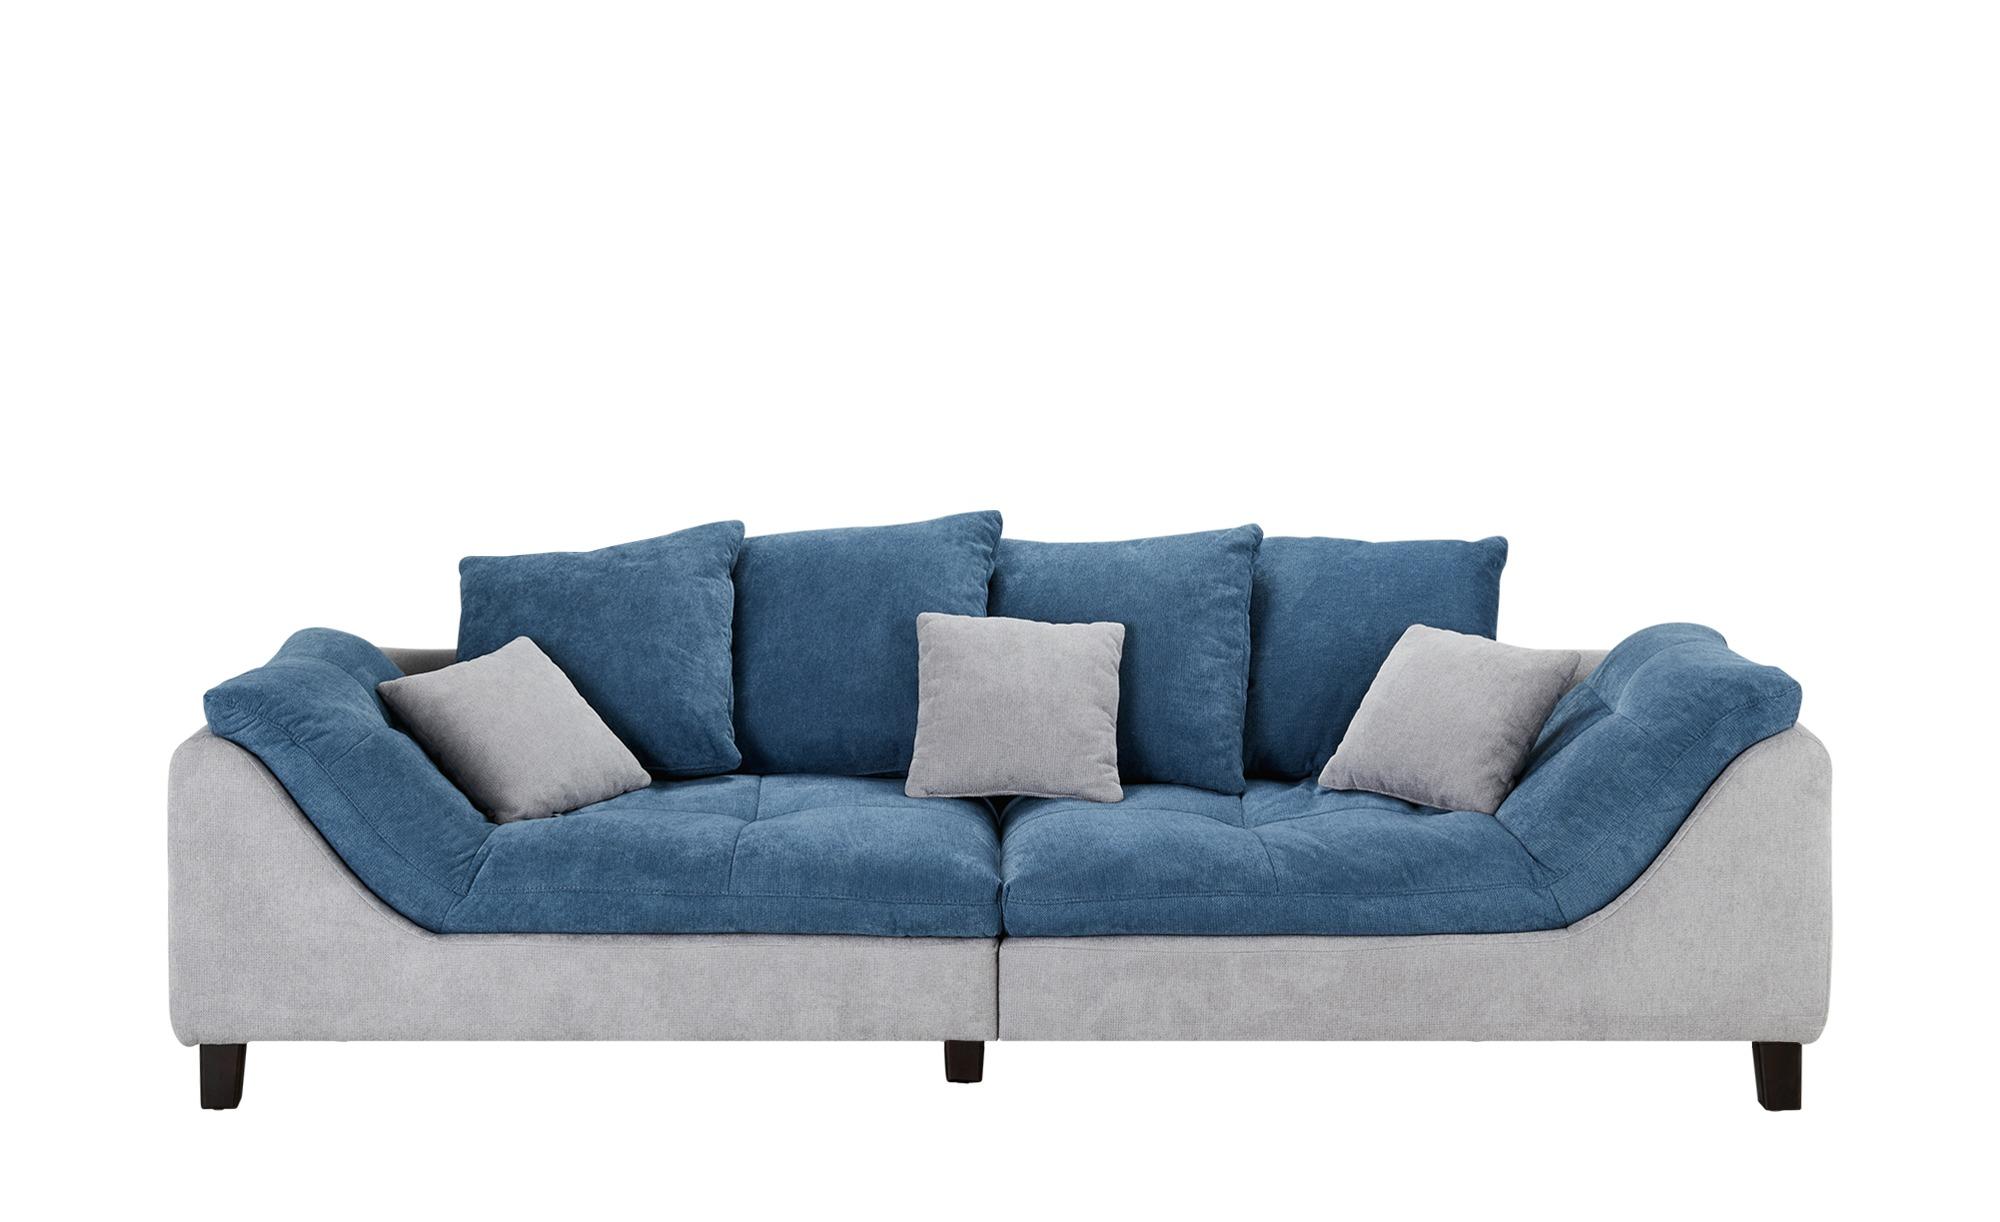 Großzügig Peachy Big Sofa Mit Schlaffunktion Galerie - Heimat Ideen ...